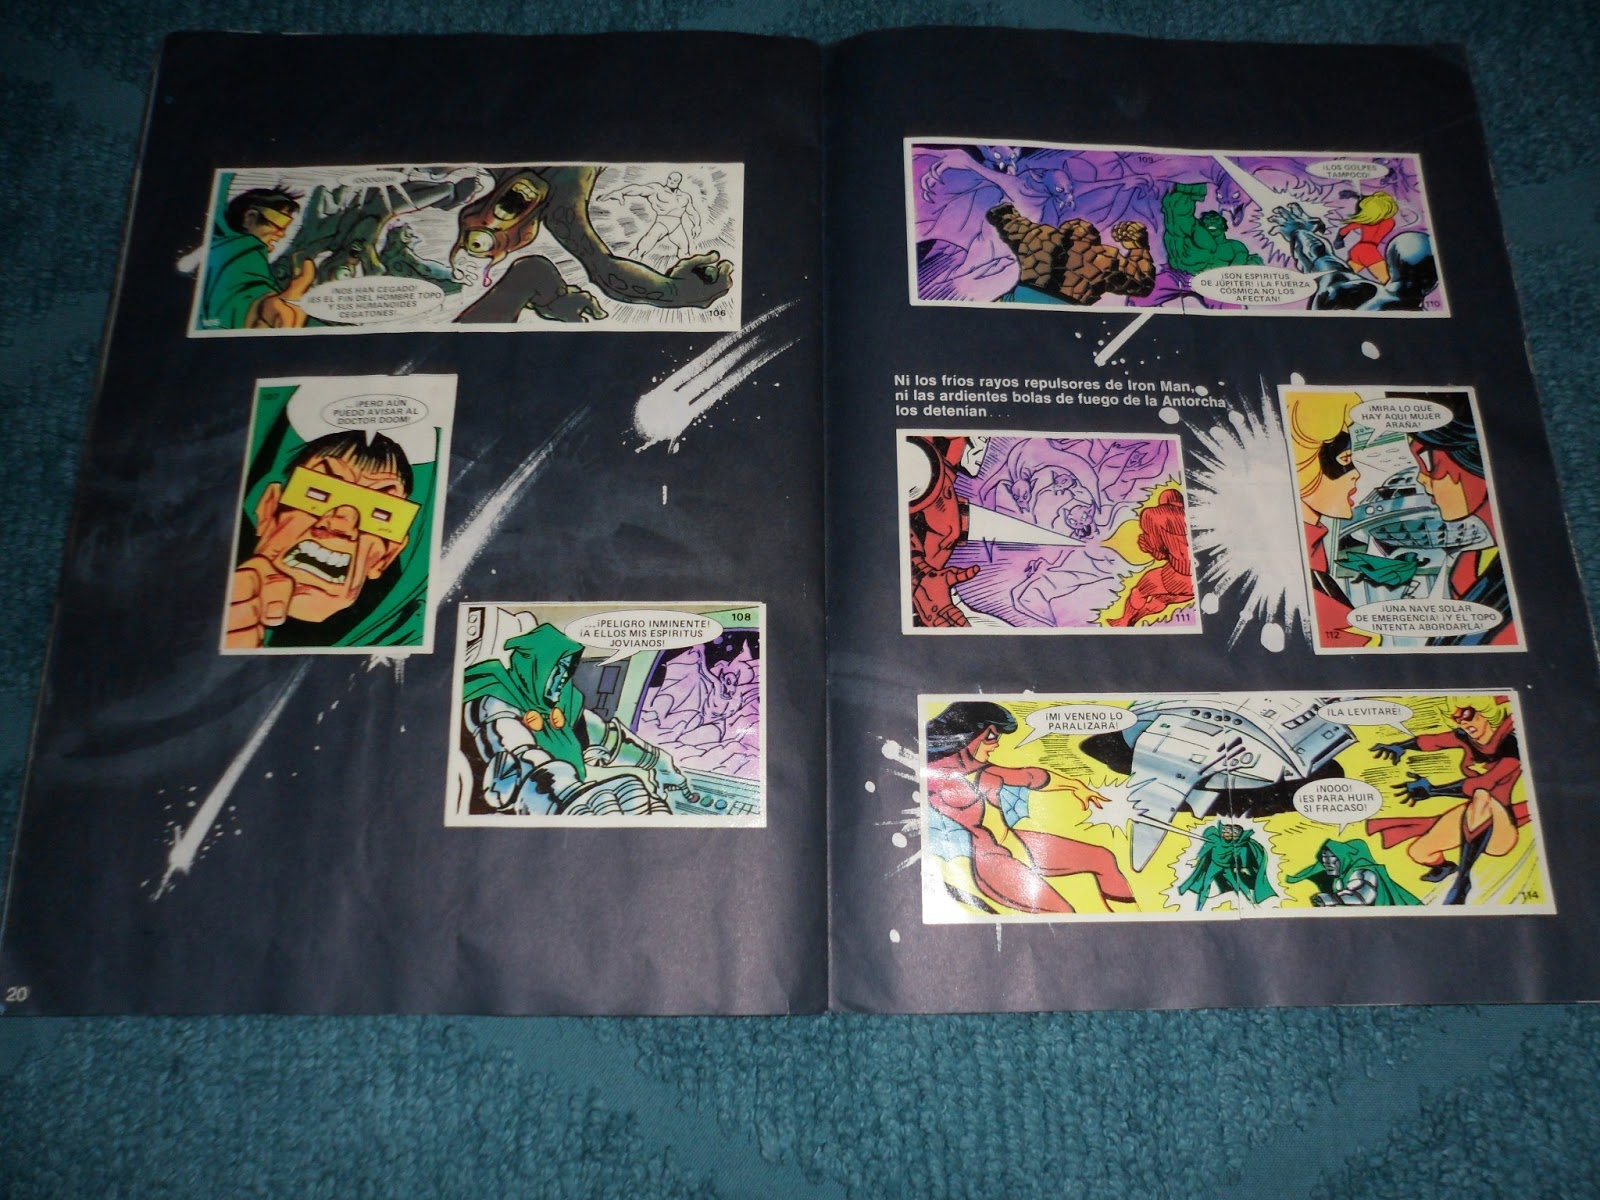 [Comics] COLECCION CLARIN 2015: AVENGERS - Página 17 SAM_2357